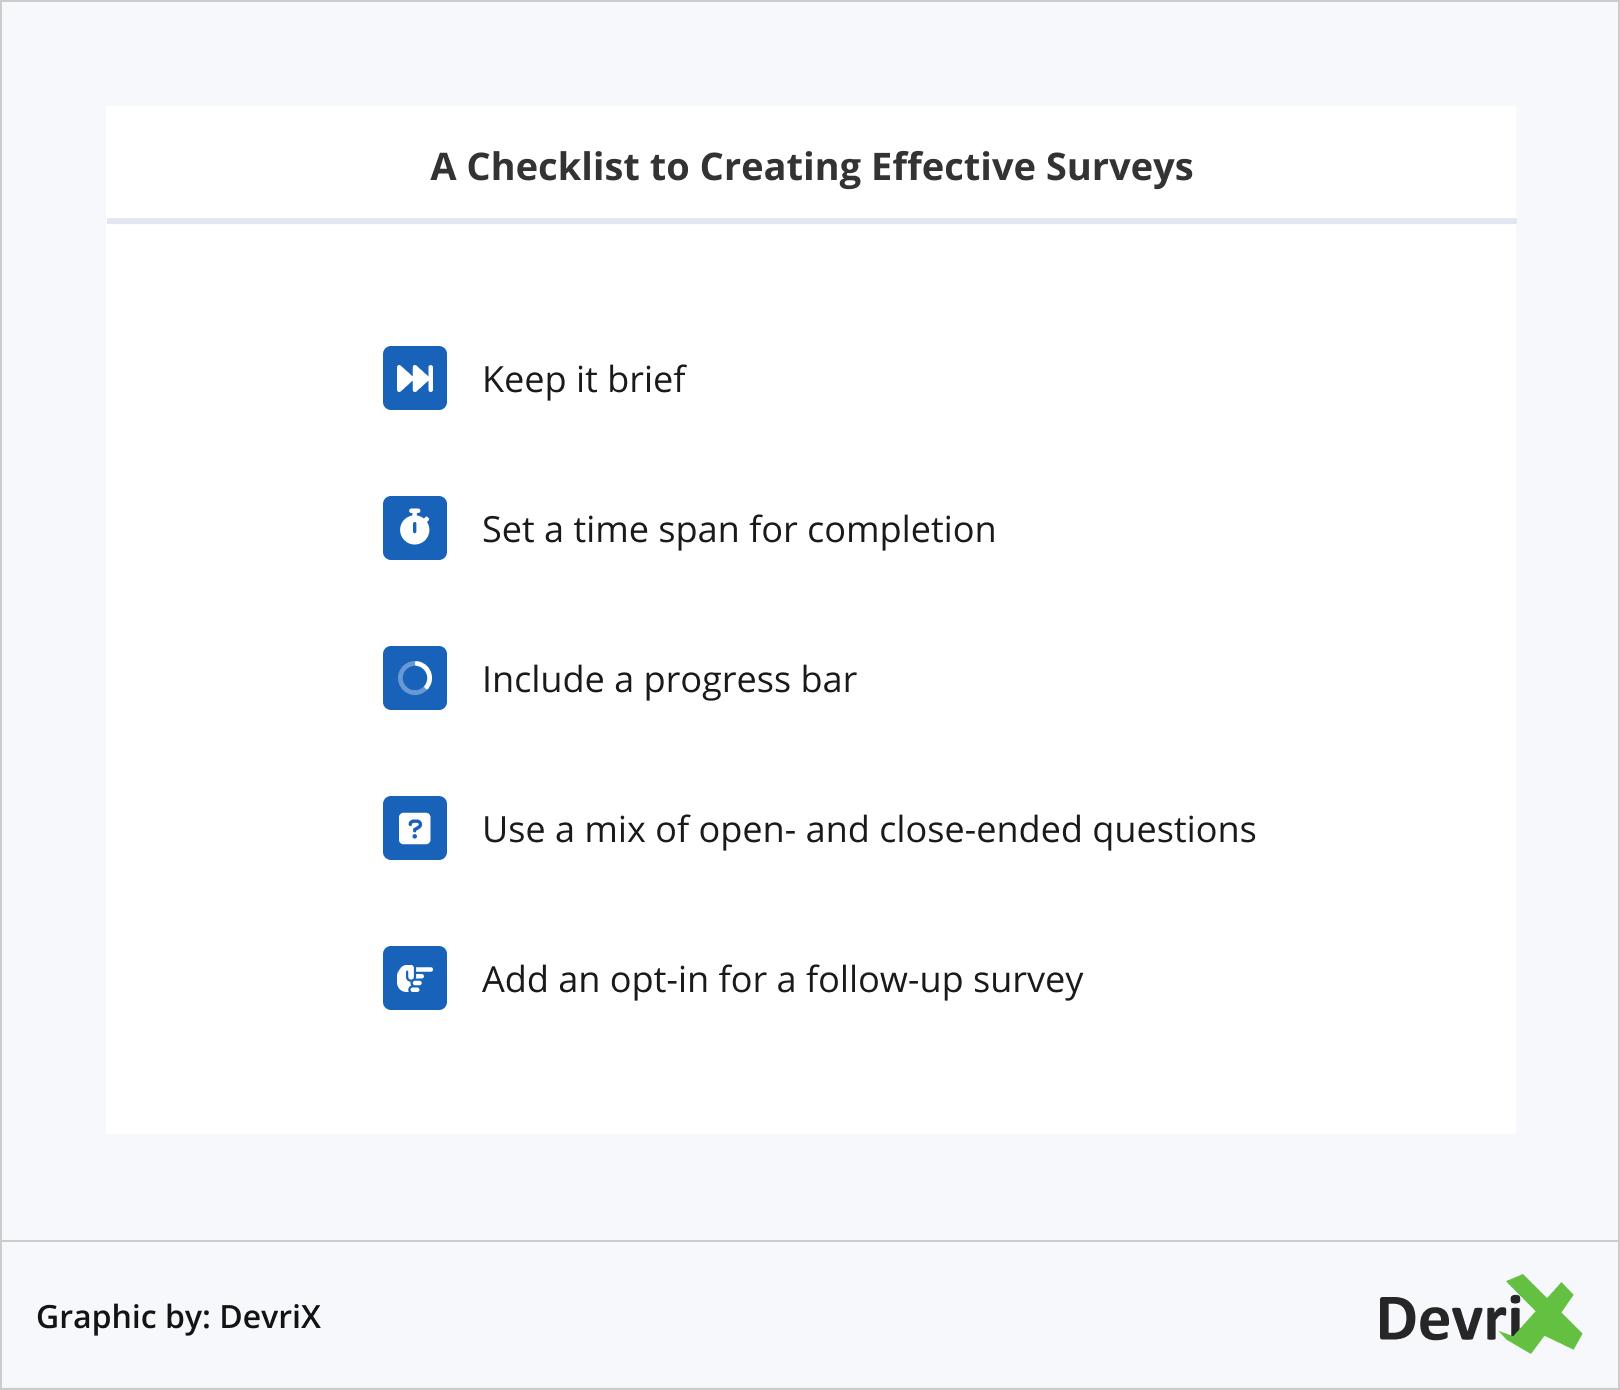 A Checklist to Creating Effective Surveys